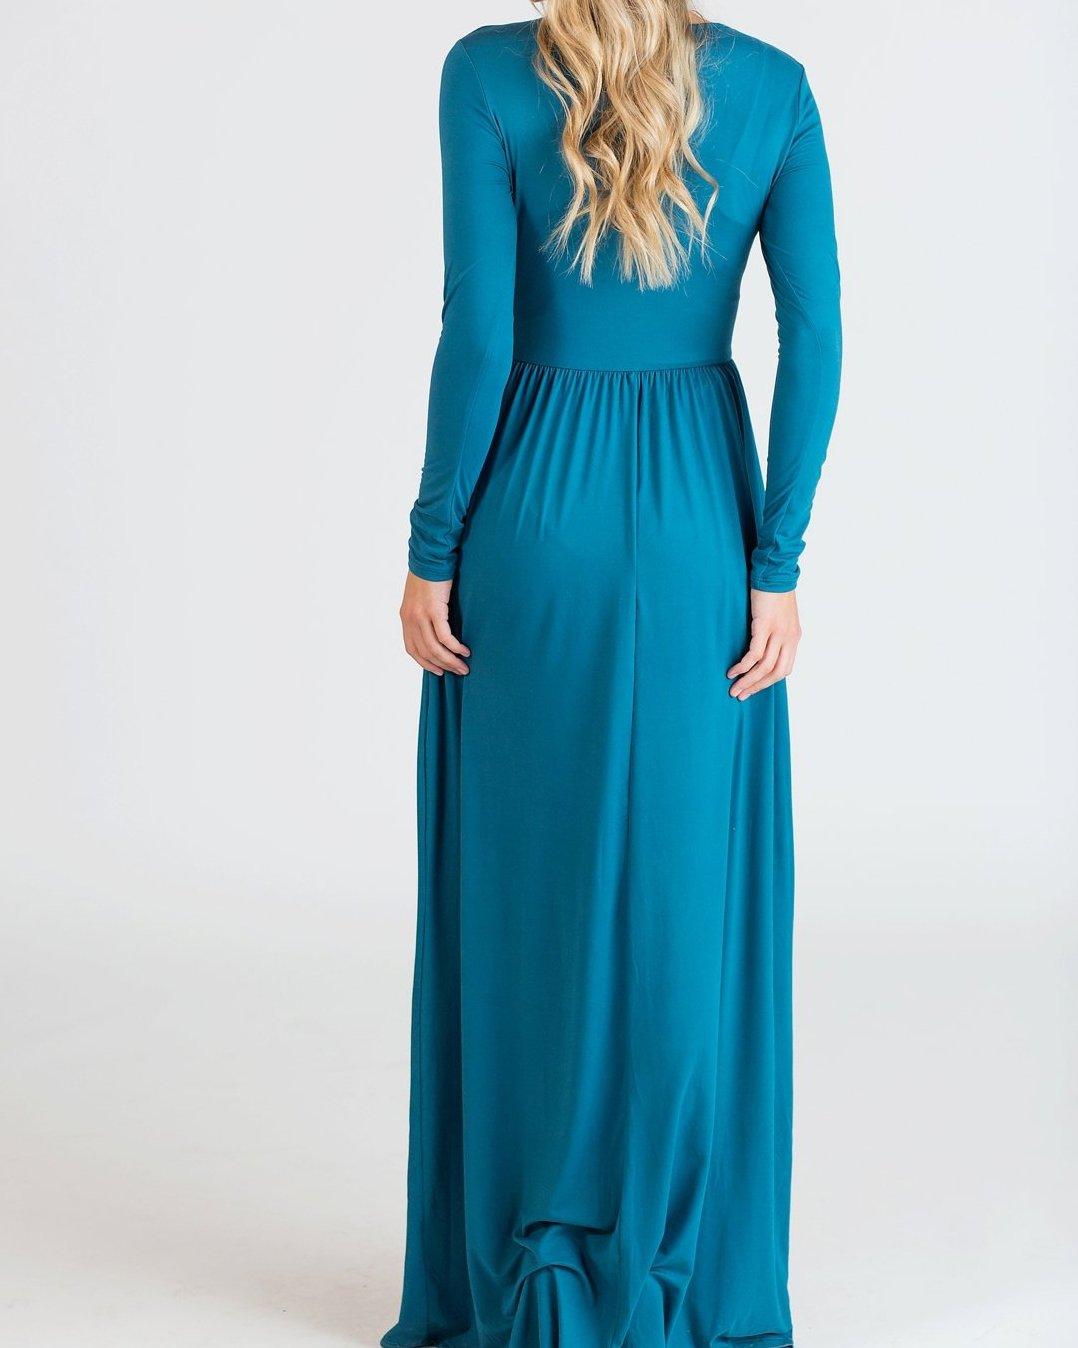 Womens Maxi Dresses Long Sleeve Casual Empire Waist Loose Wrap Dress ...